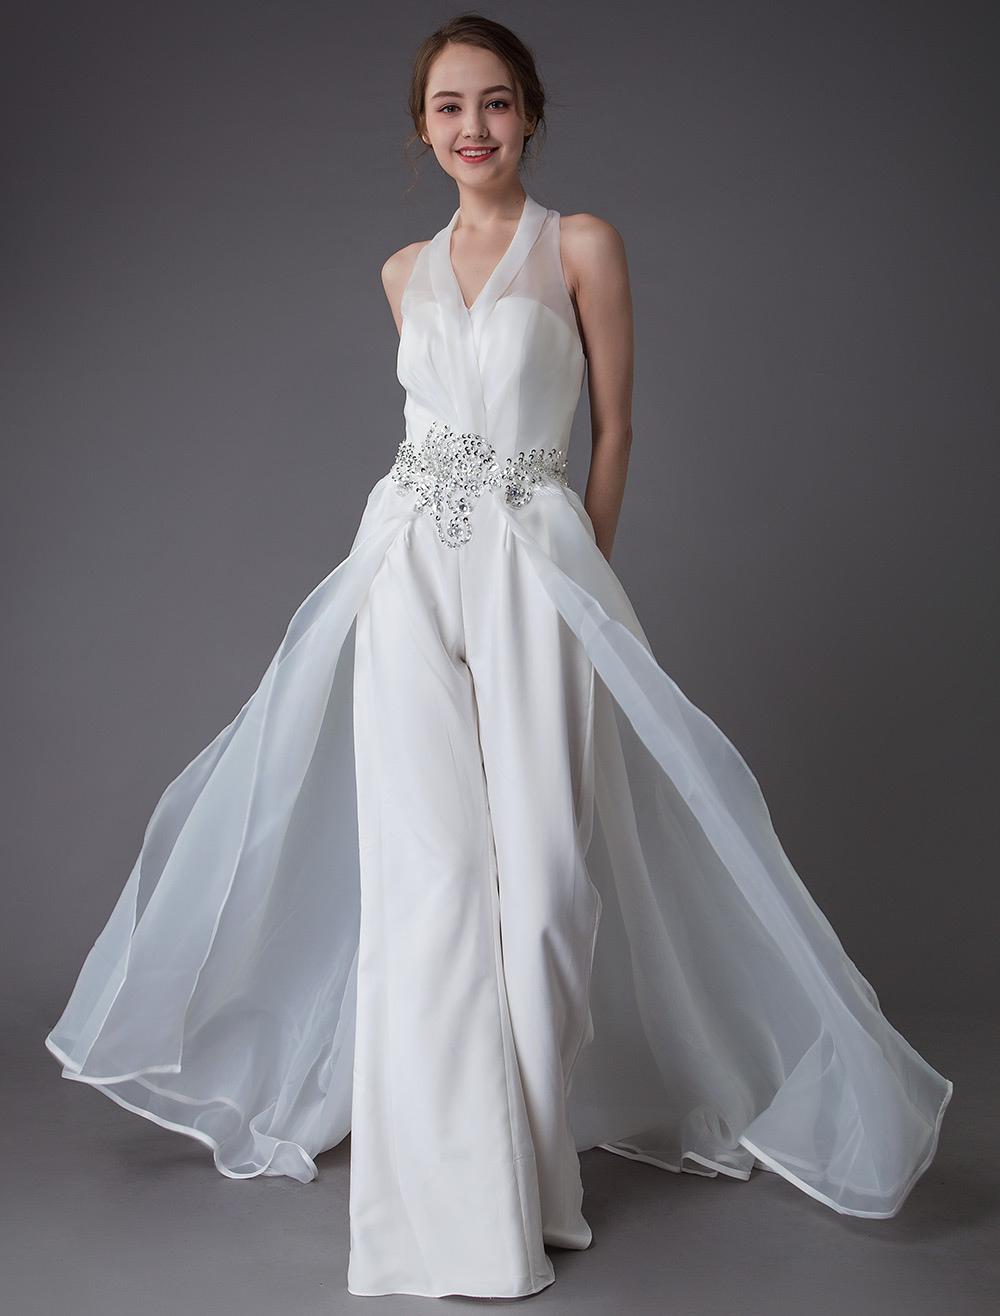 Ivory Wedding Jumpsuits Halter V Neck Rhinestones Backless Culottes Bridal Dress